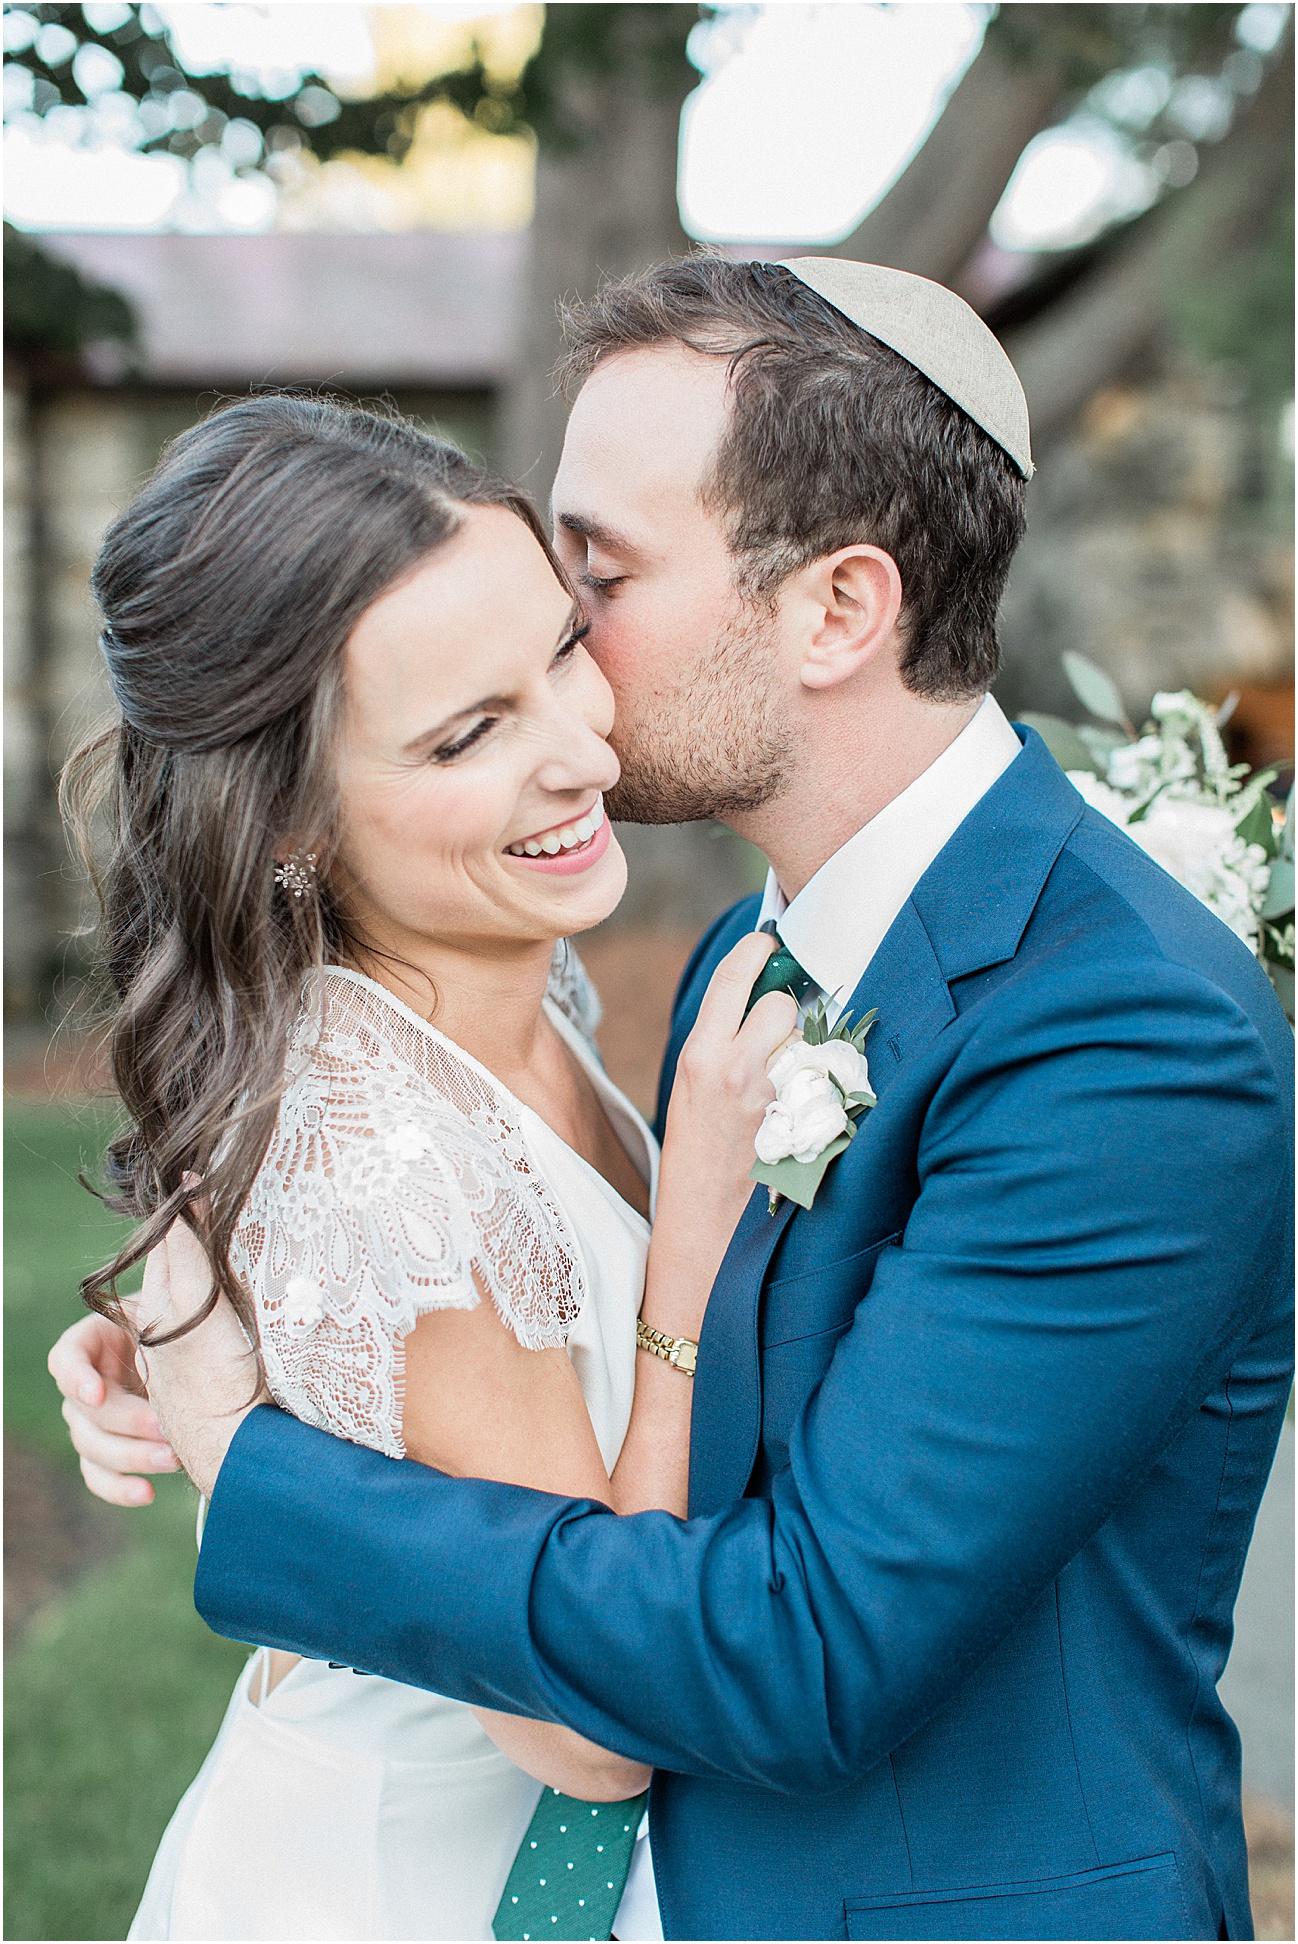 jenna_mike_willowdale_estate_topsfield_neutral_whites_greens_fall_cape_cod_boston_wedding_photographer_meredith_jane_photography_photo_1452.jpg